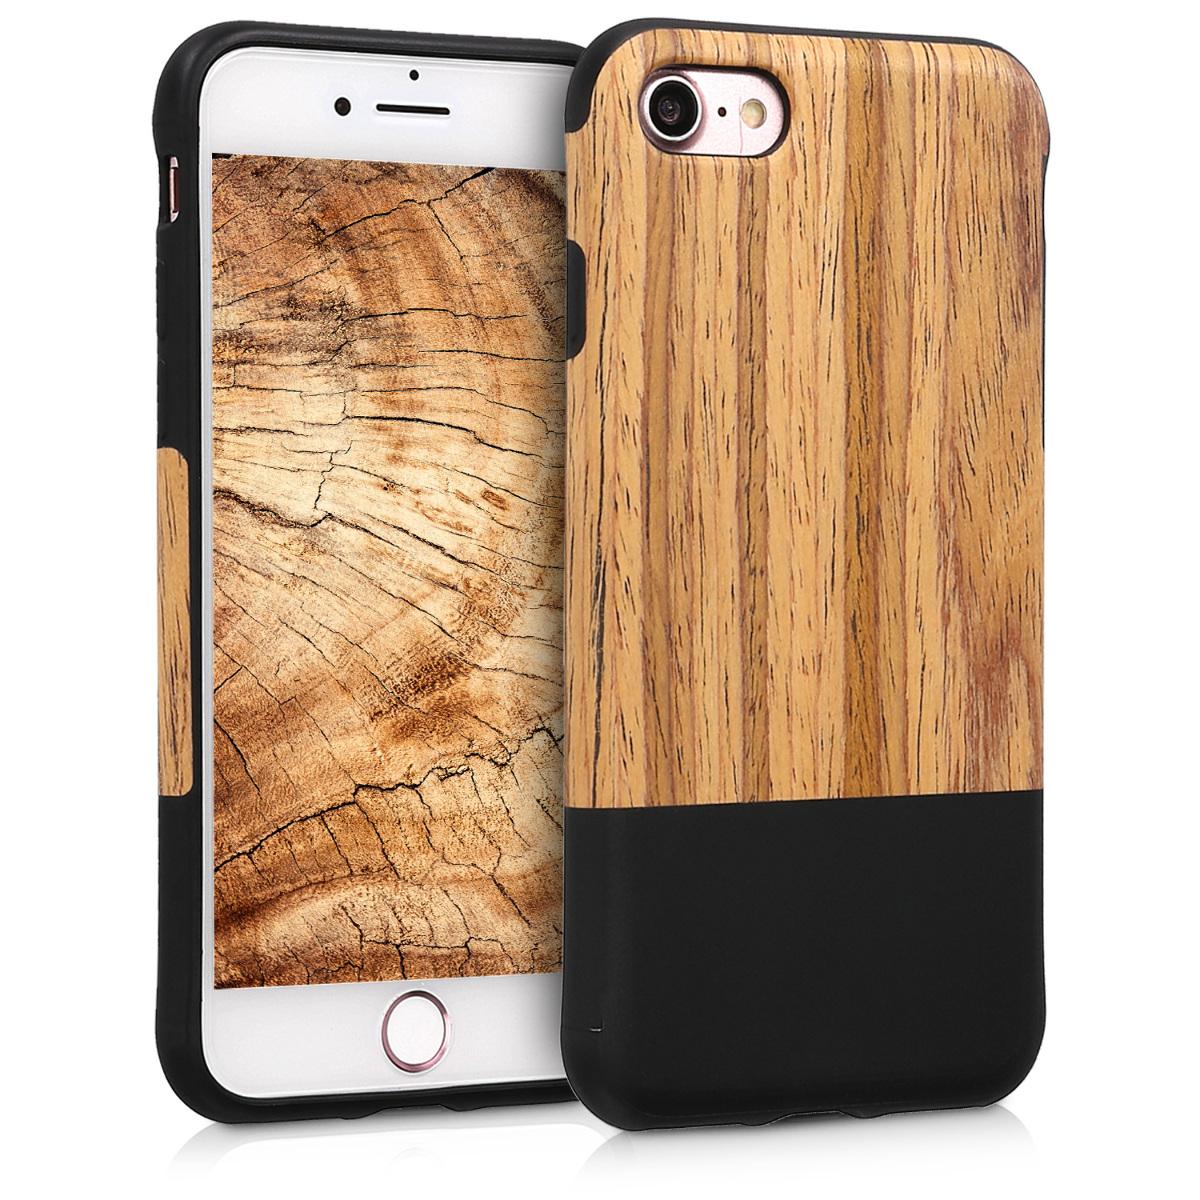 KW Σκληρή Ξύλινη Θήκη -  iPhone 7 / 8 - TPU - Two-Tone - (45571.01)